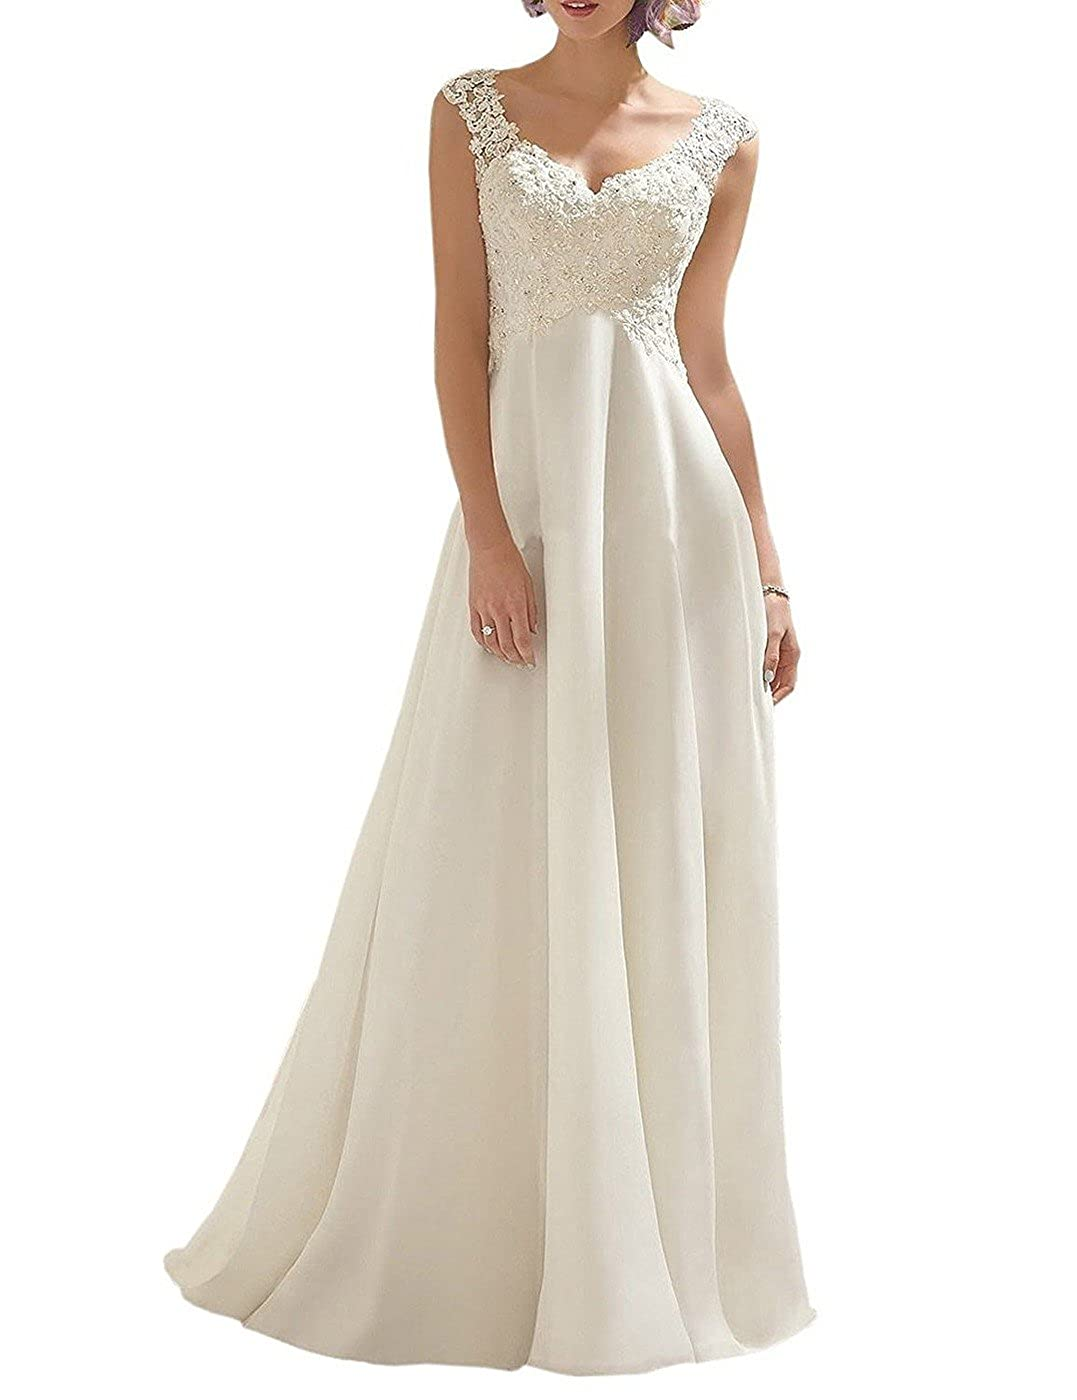 Borje Womens Double V-Neck Sleeveless Lace Wedding Dress Evening Dress